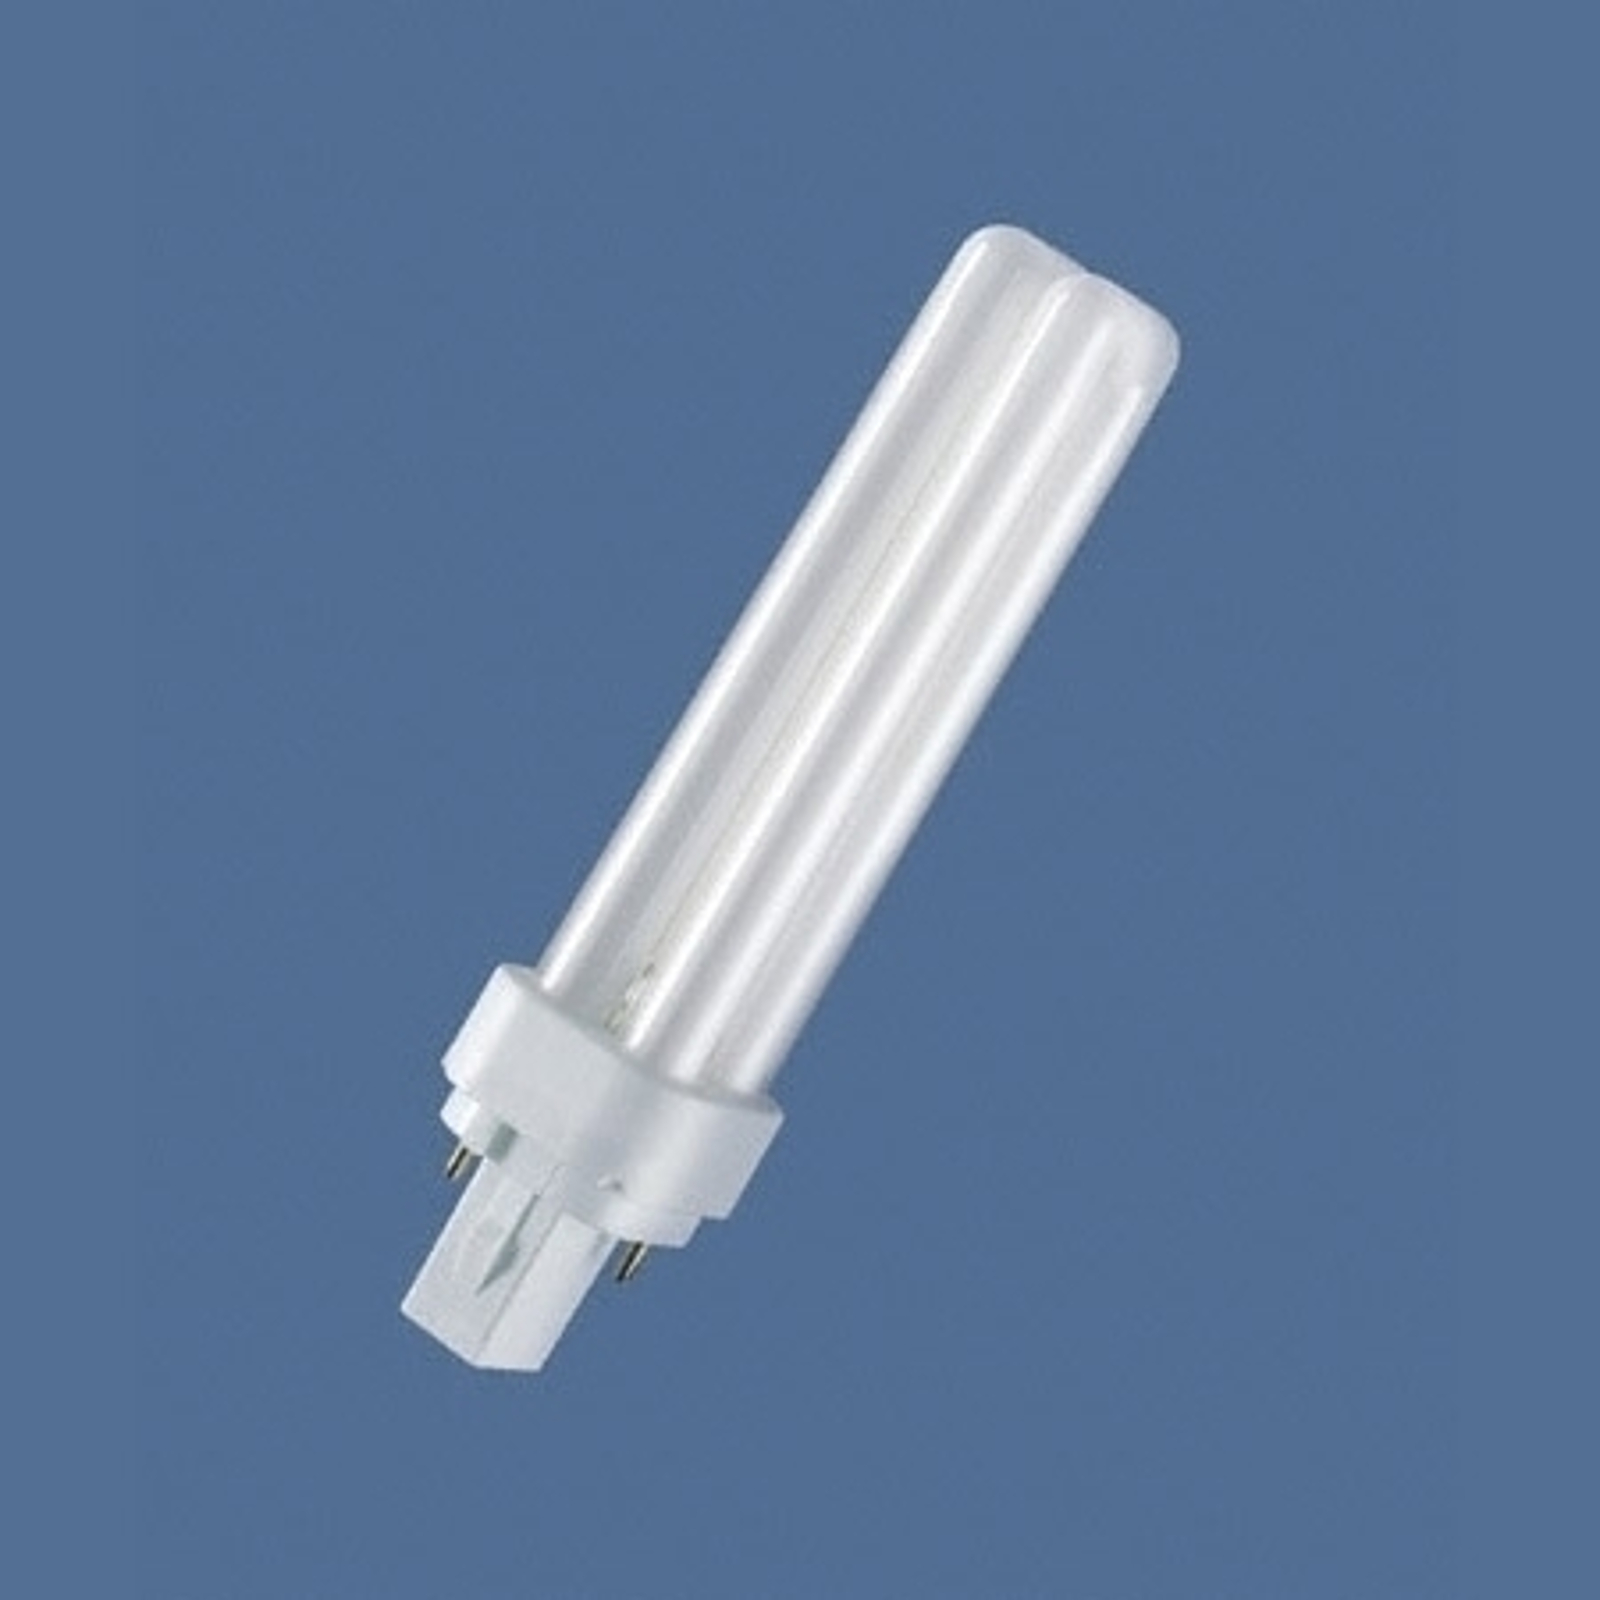 G24d 13W 830 Kompaktleuchtstofflampe Dulux D